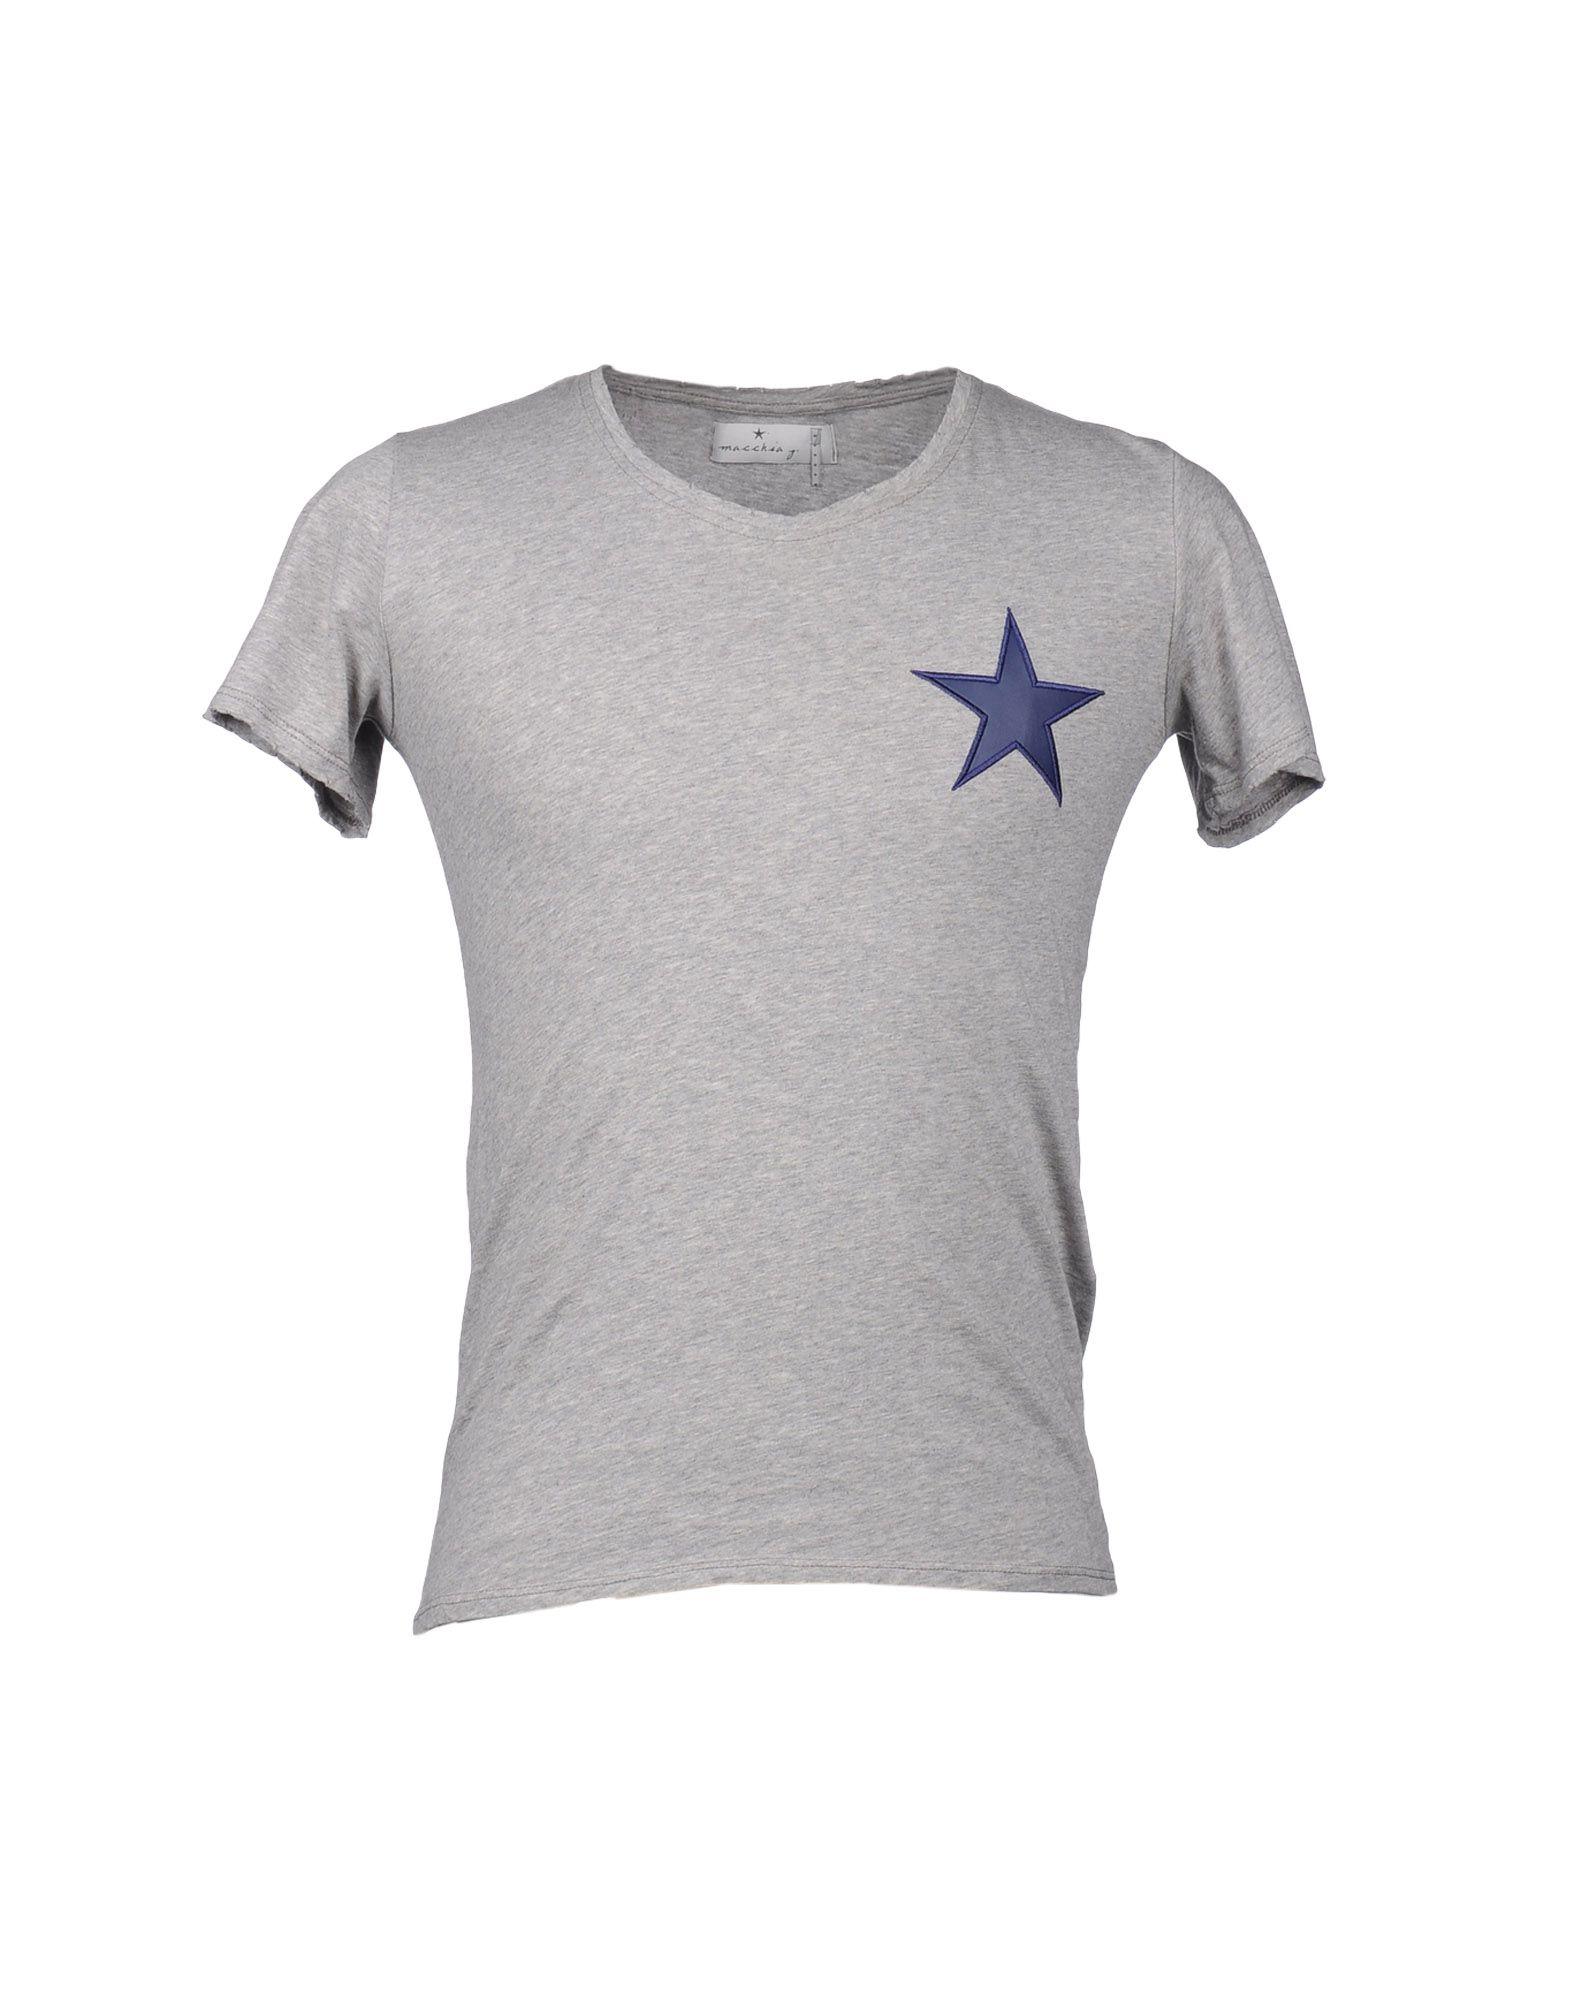 MACCHIA J Футболка с короткими рукавами футболка b twin велосипедная футболка с короткими рукавами 100 голубая